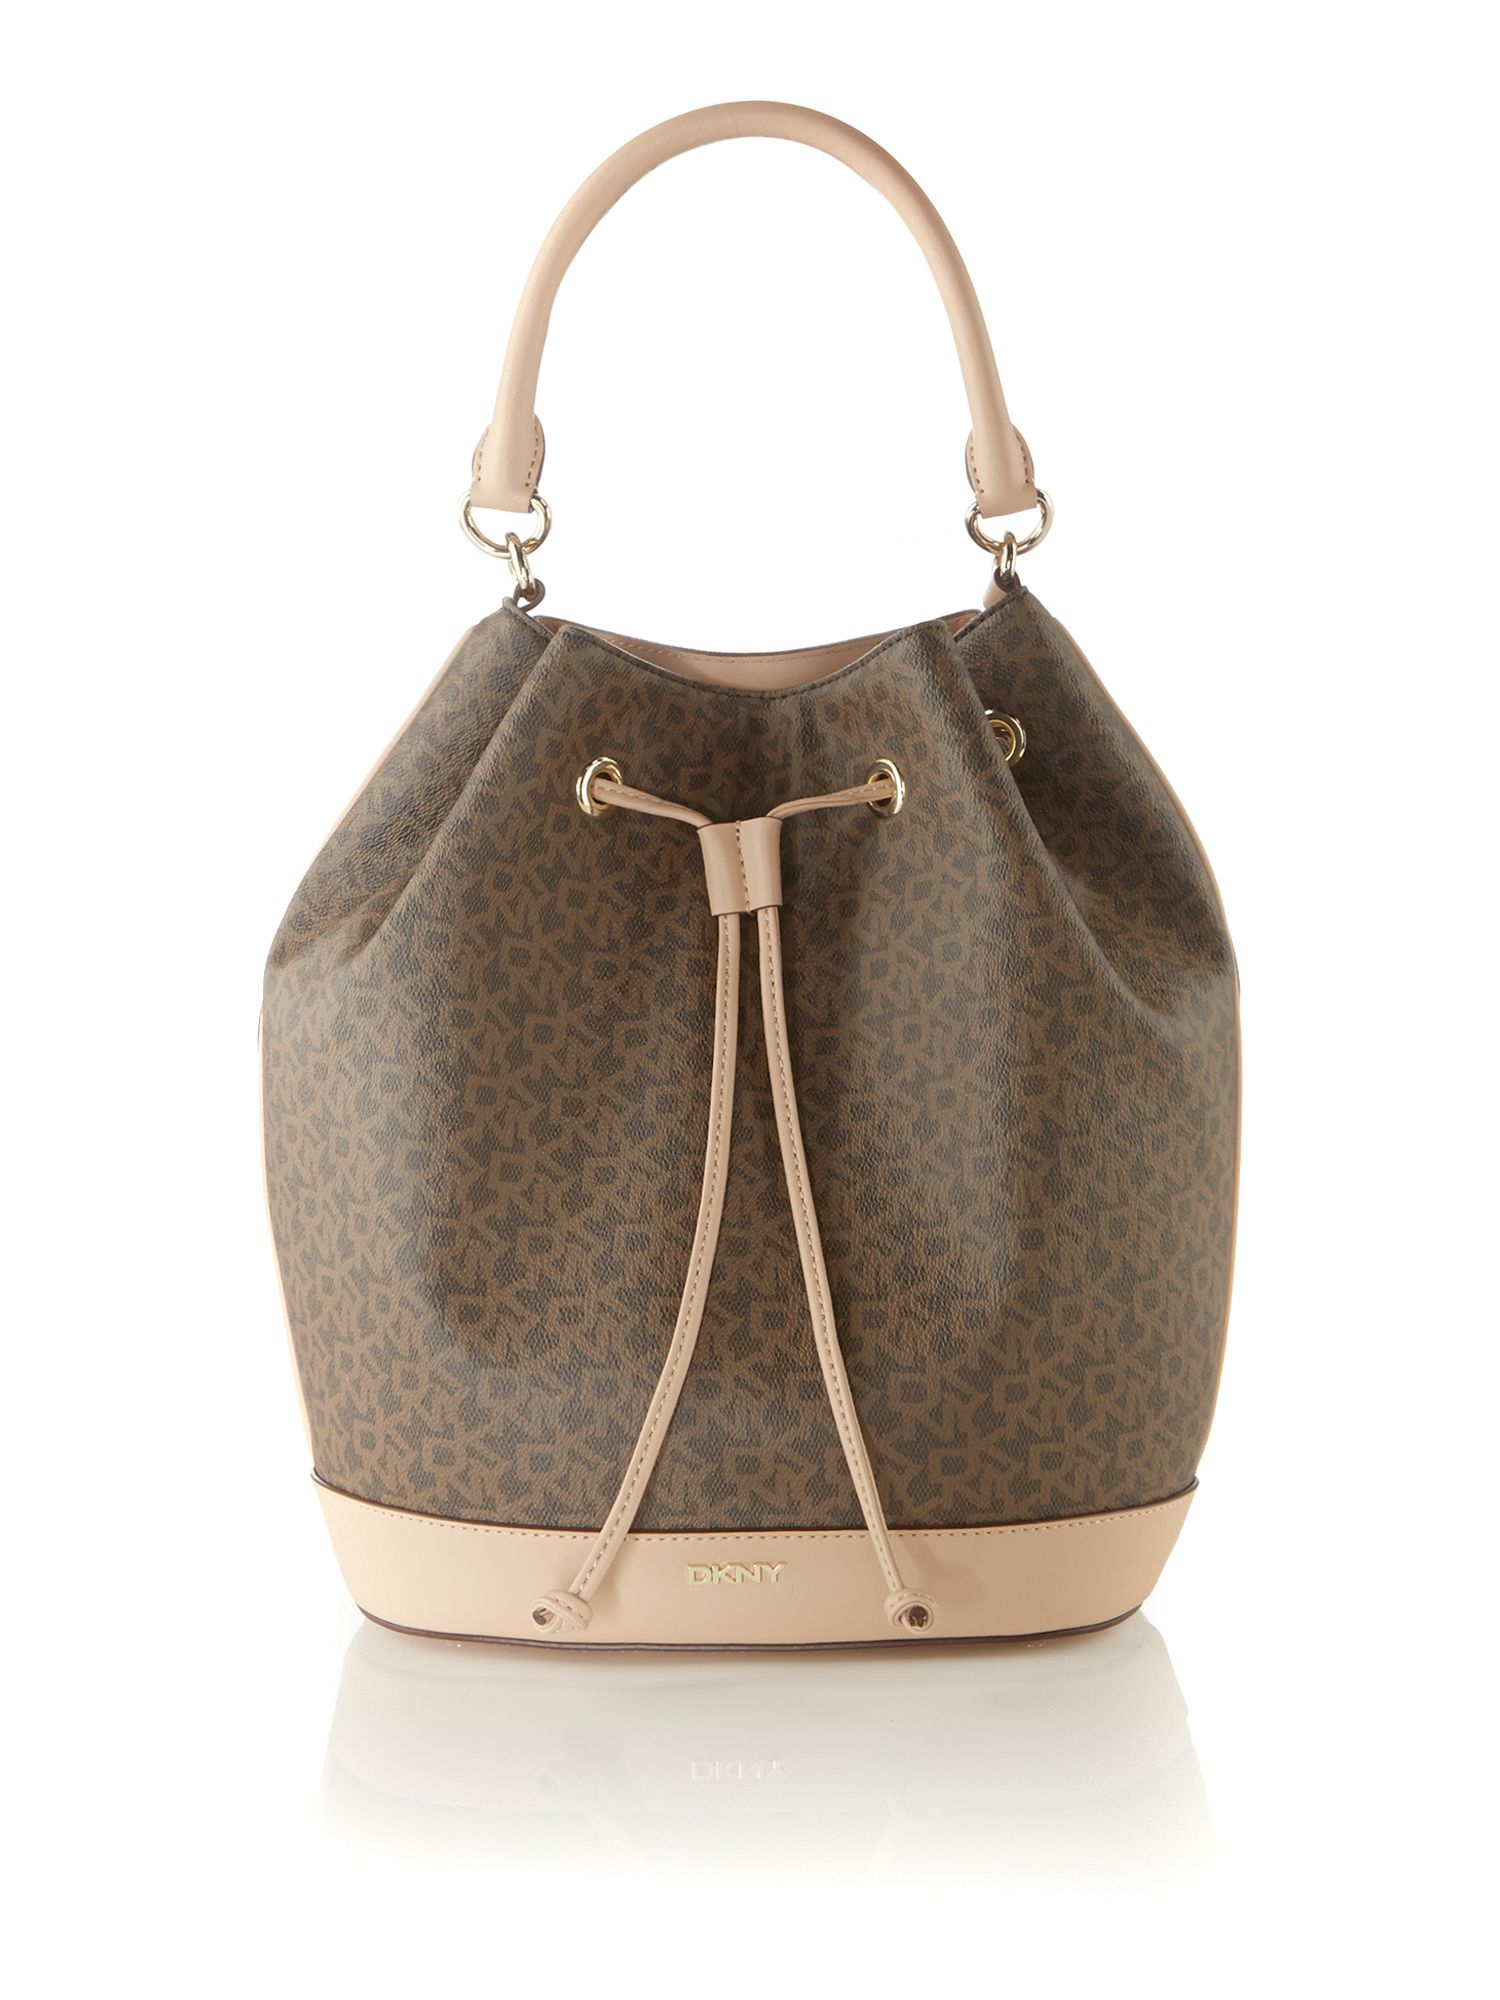 House of fraser handbags dkny style guru fashion glitz for Housse of fraser